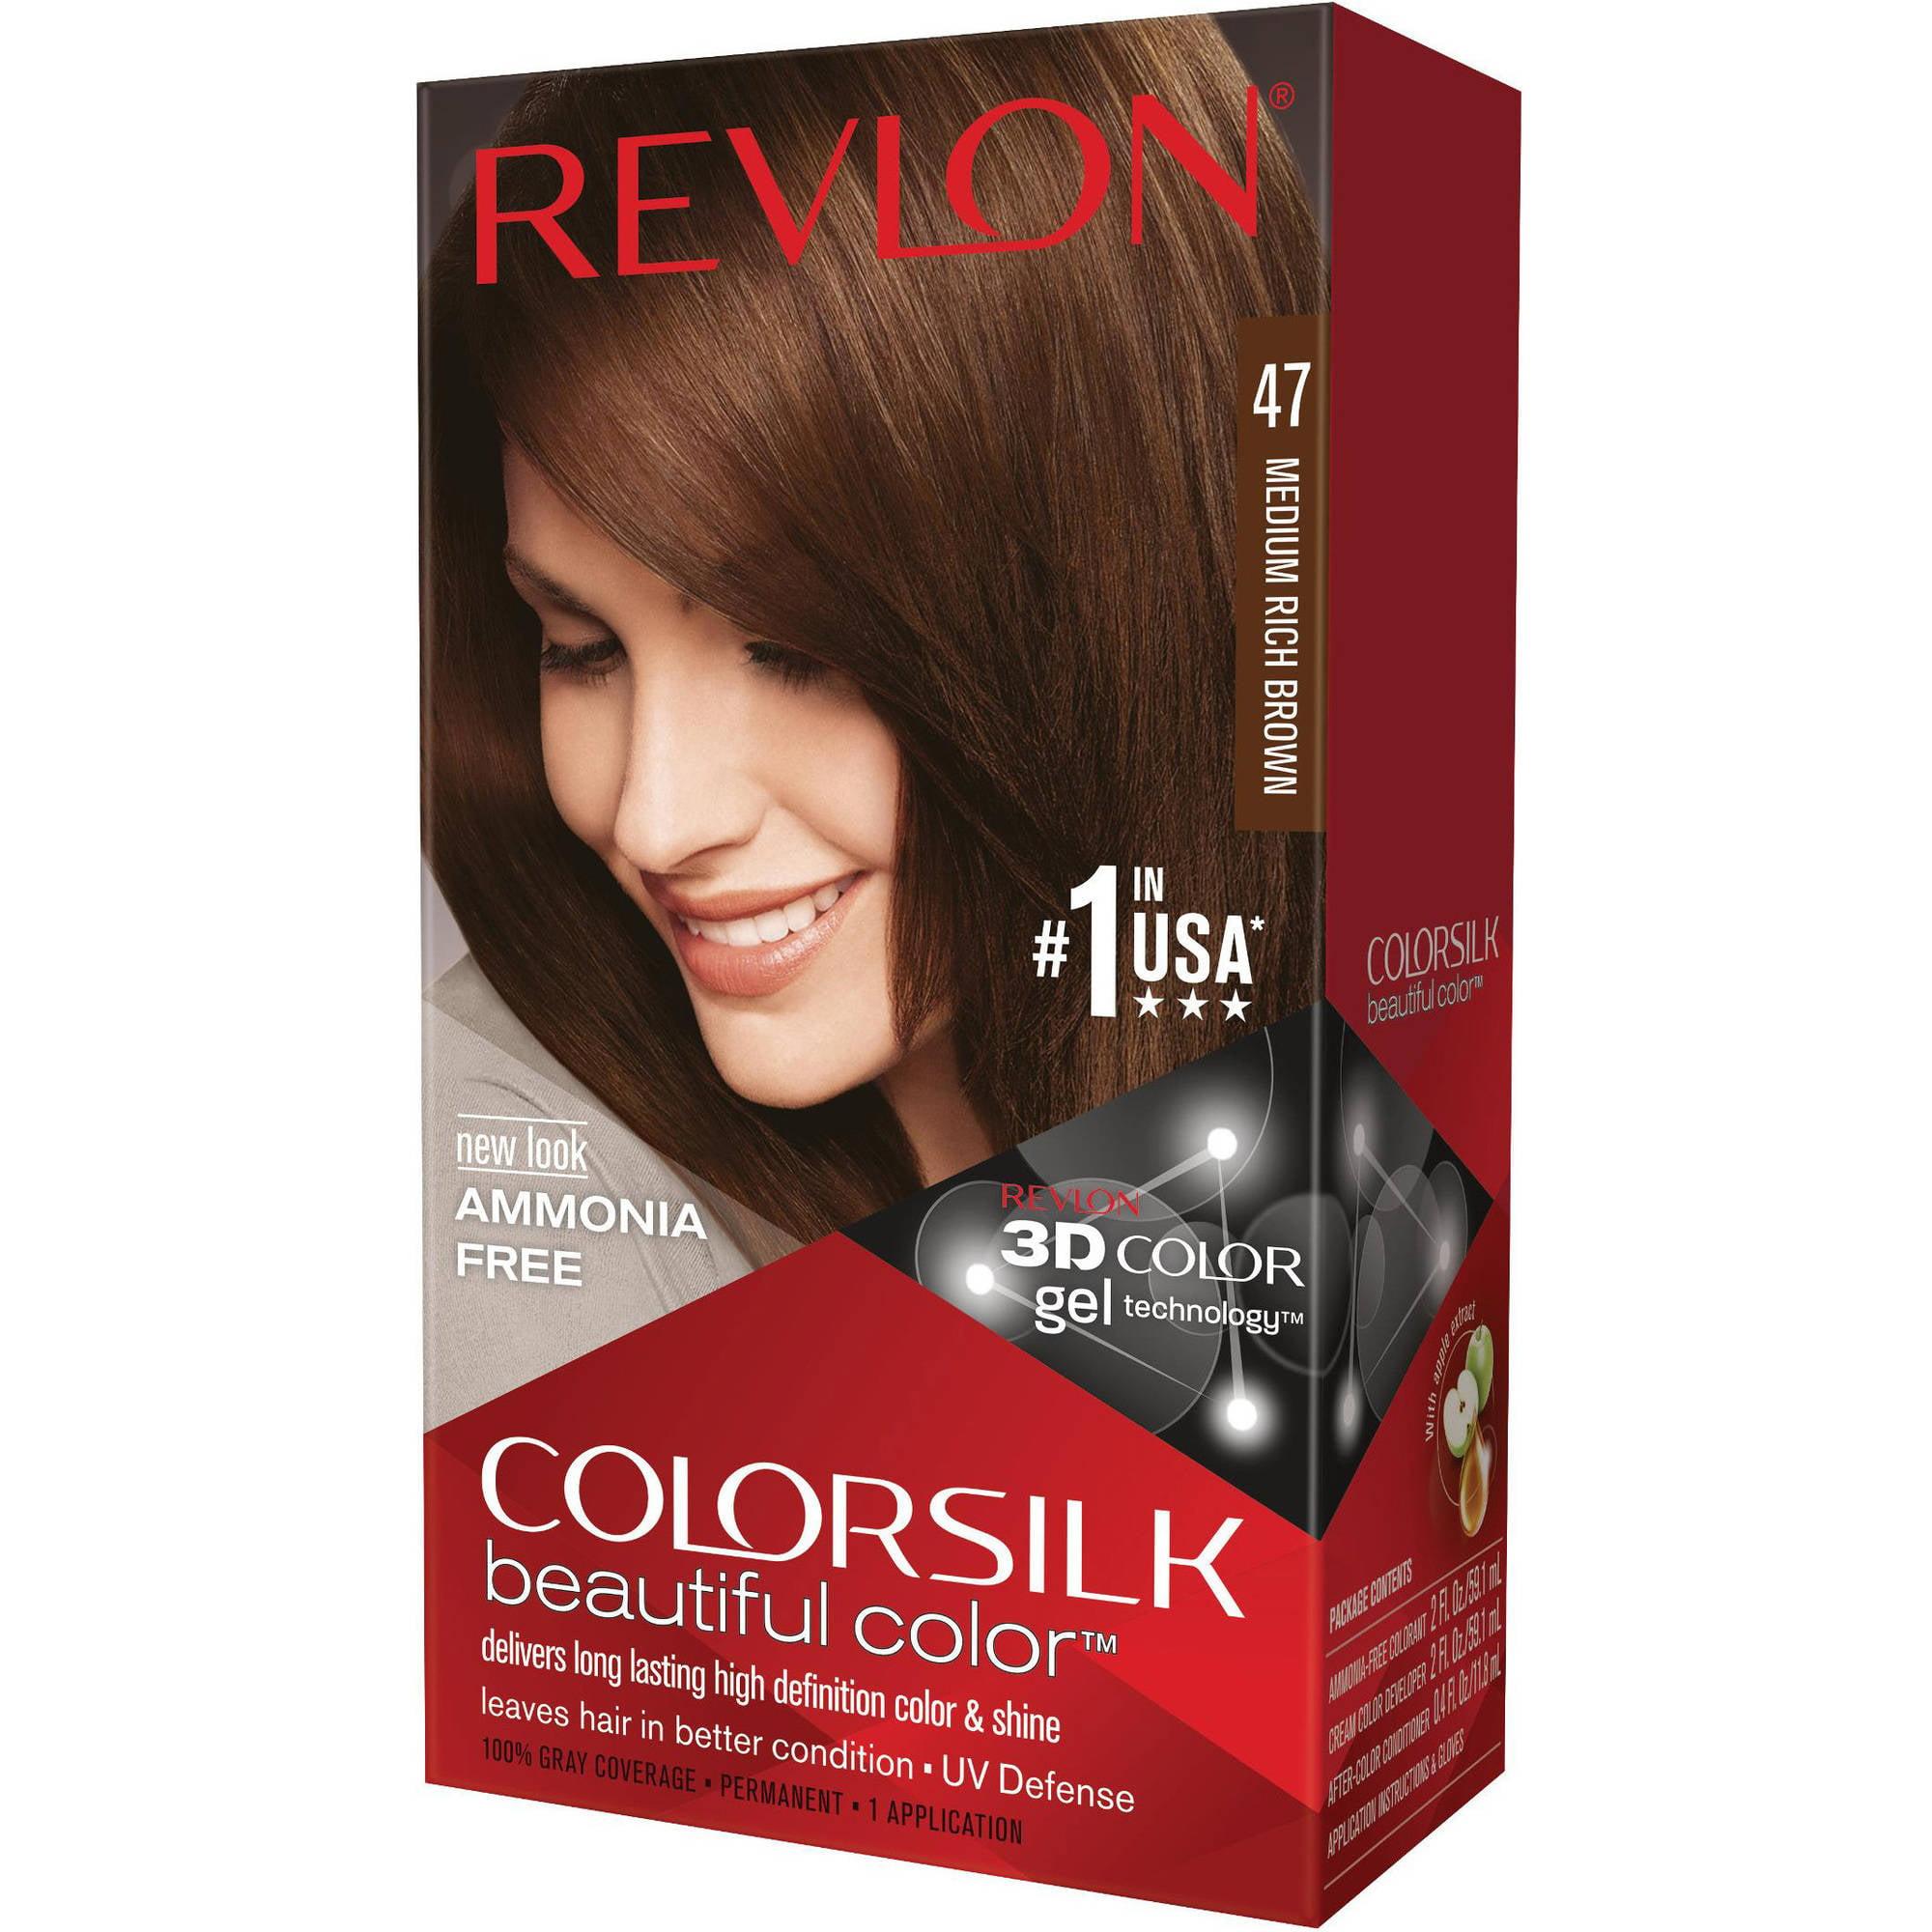 Revlon Colorsilk Beautiful Color Permanent Hair Color, 47 Medium Rich Brown